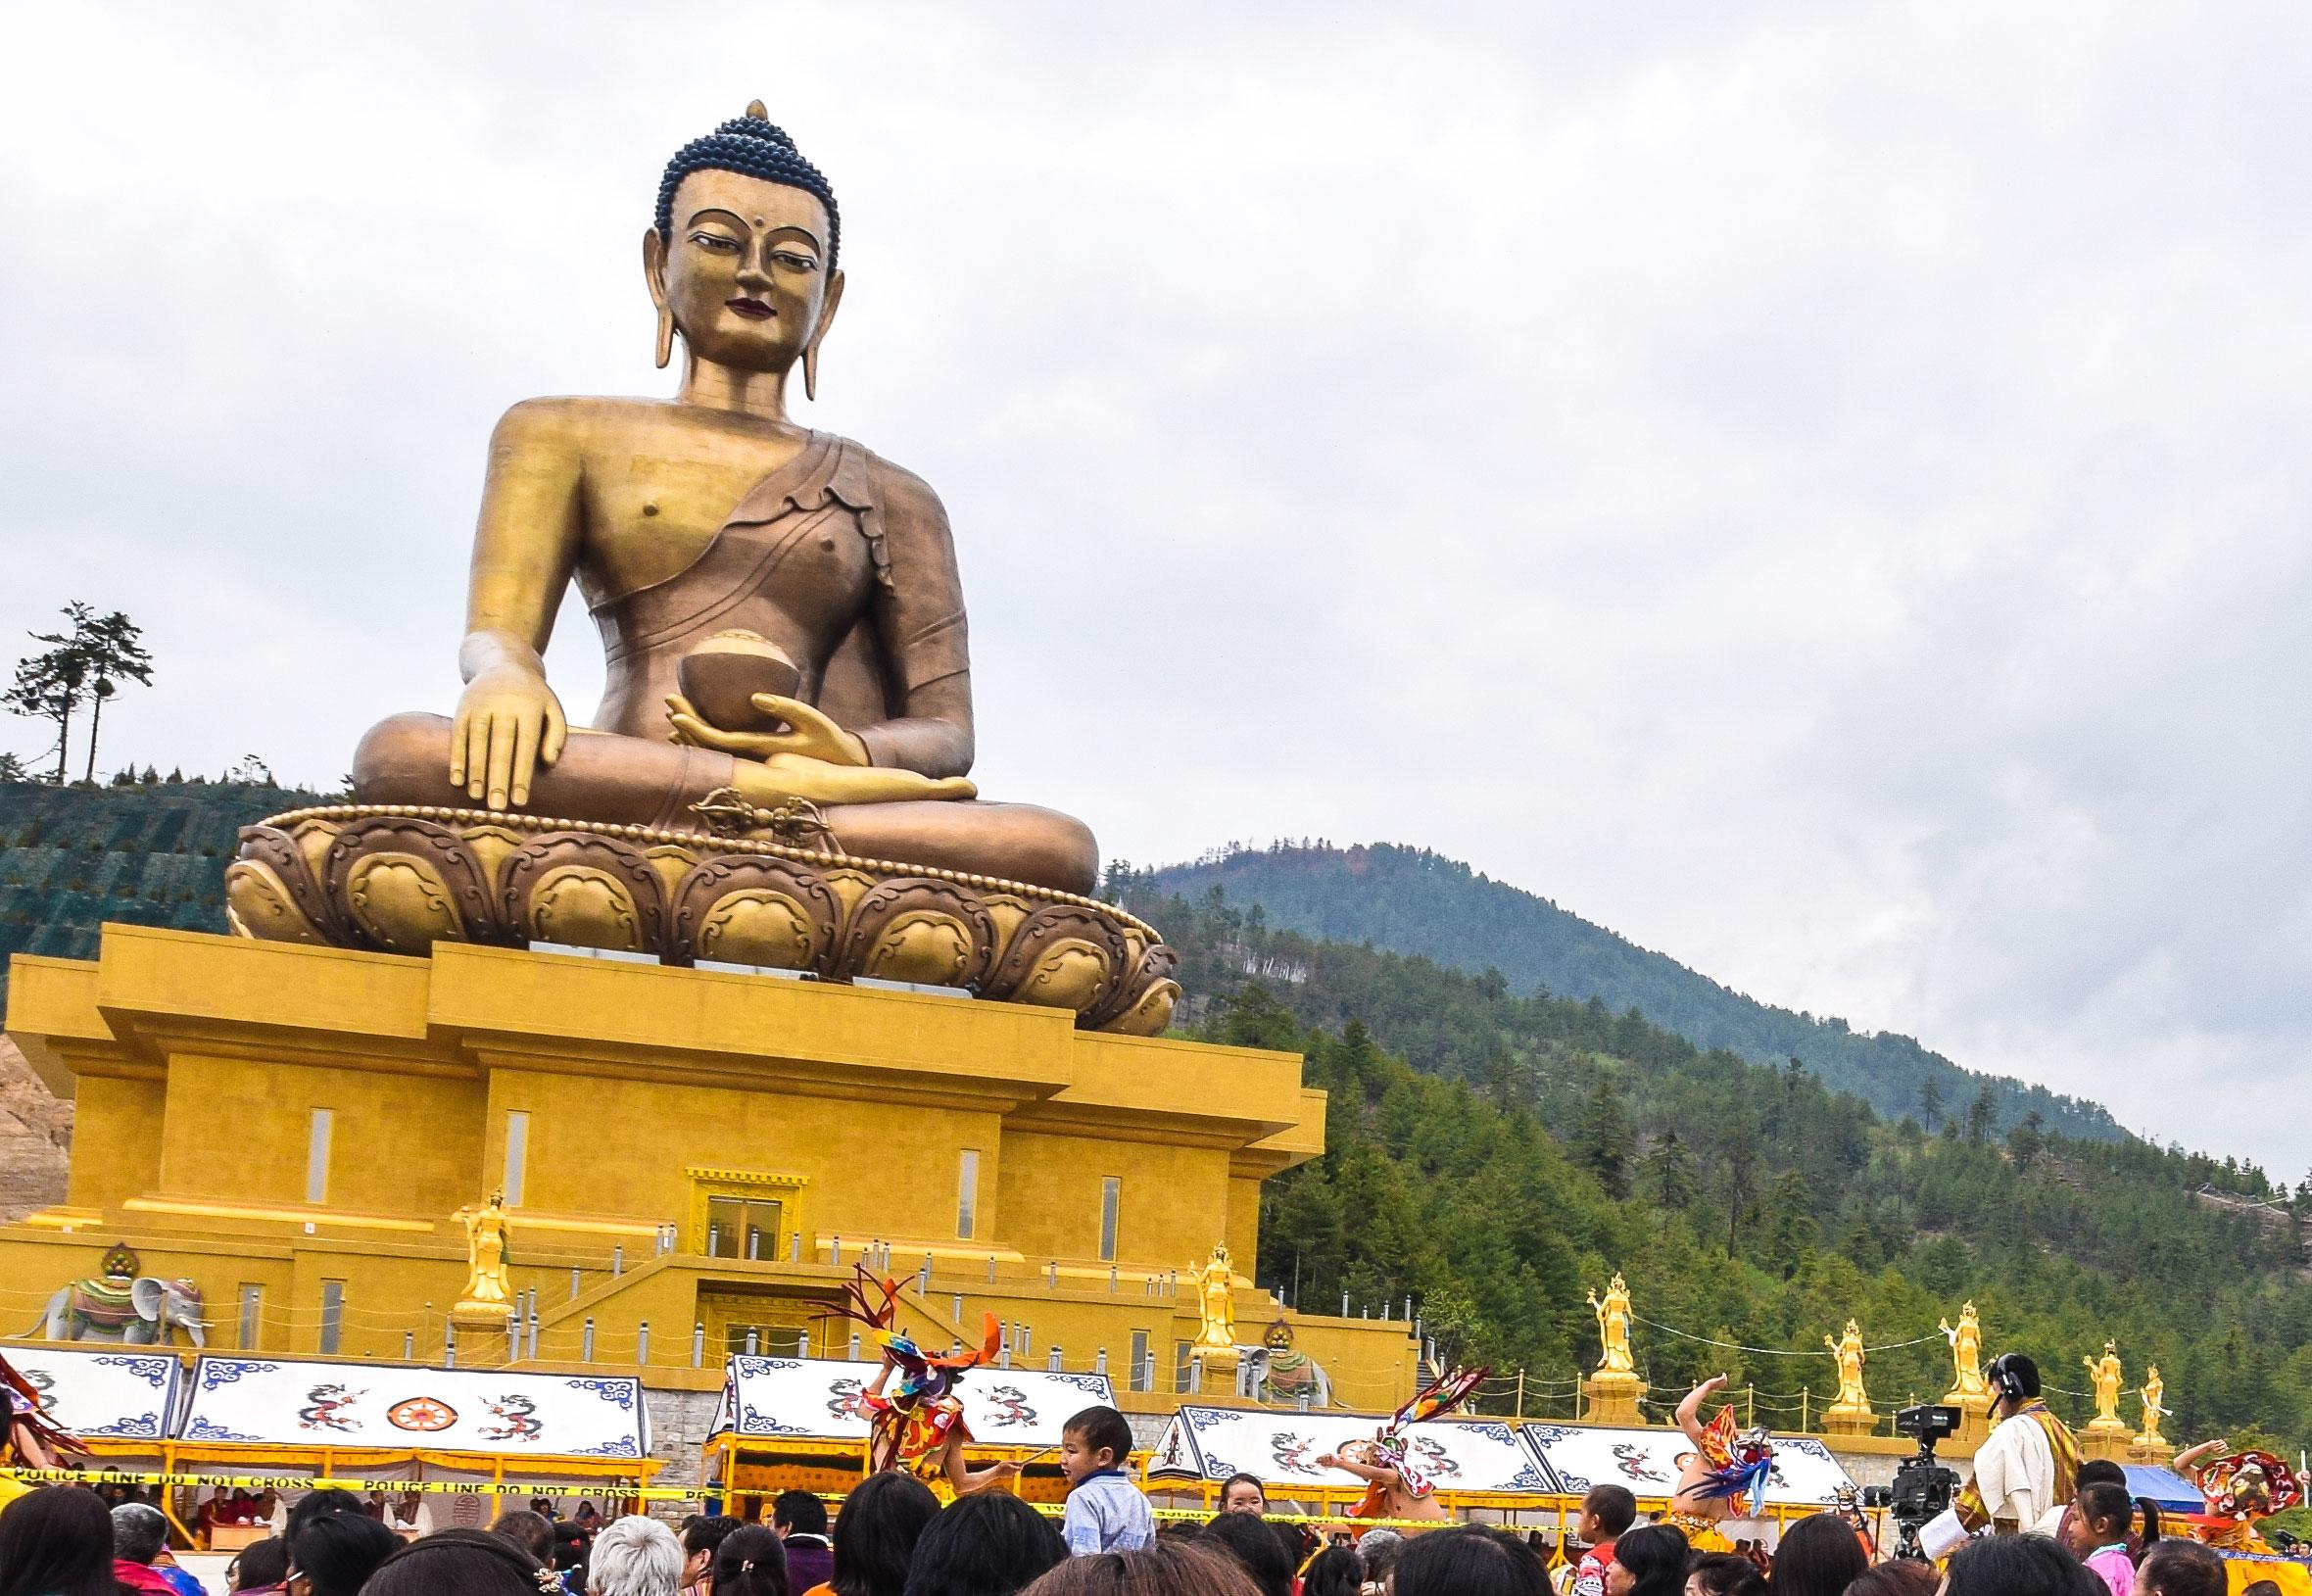 The Giant Copper Buddha at Thimphu, Bhutan's Capital. Copyrighted. Source: bhutanhimalaya.com